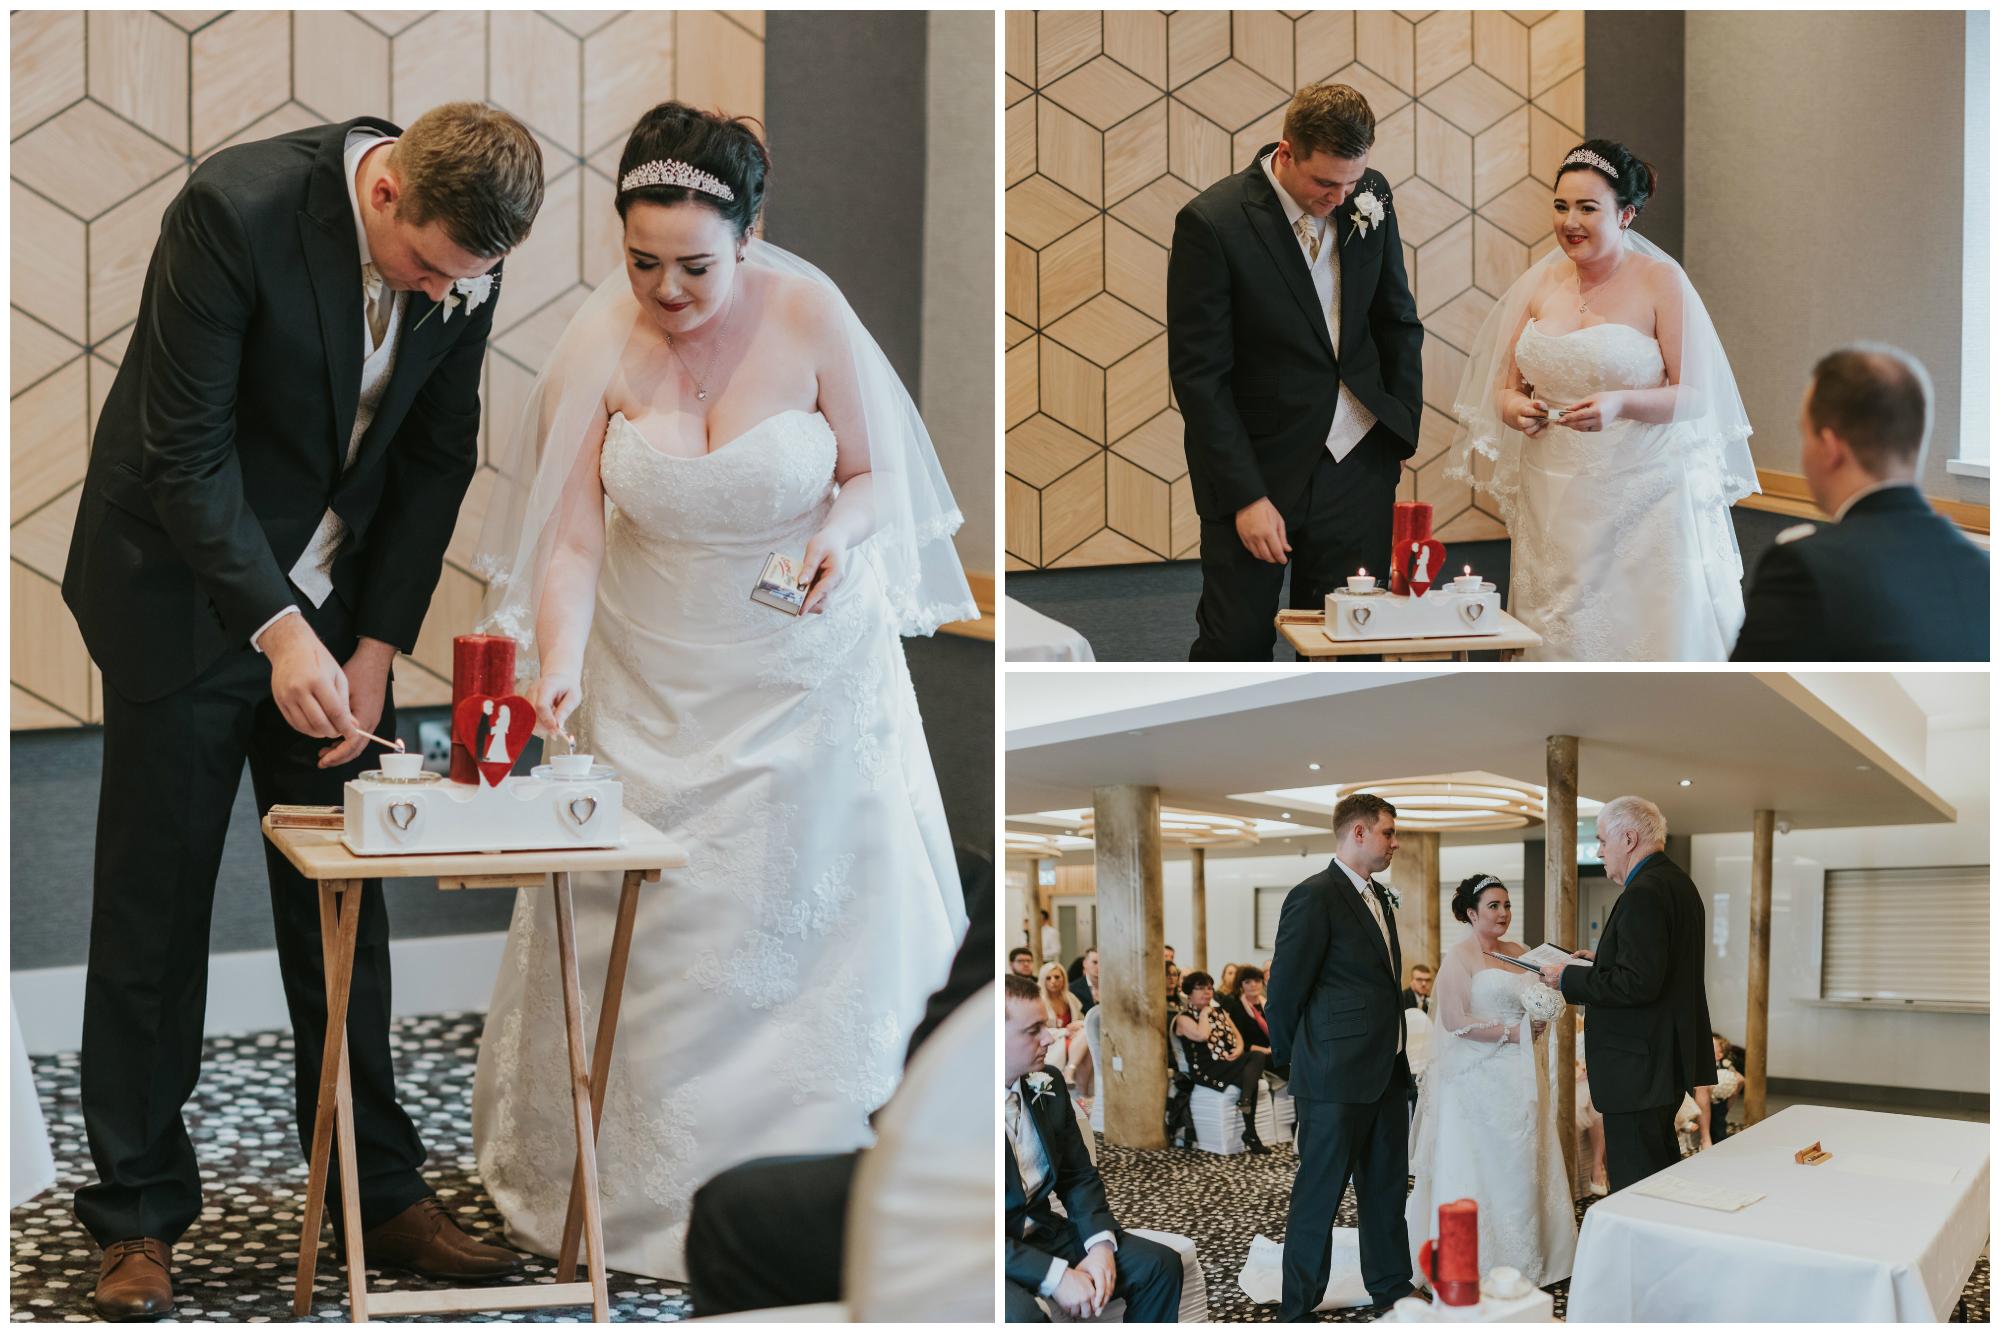 ten square hotel wedding ceremony belfast bride groom candles